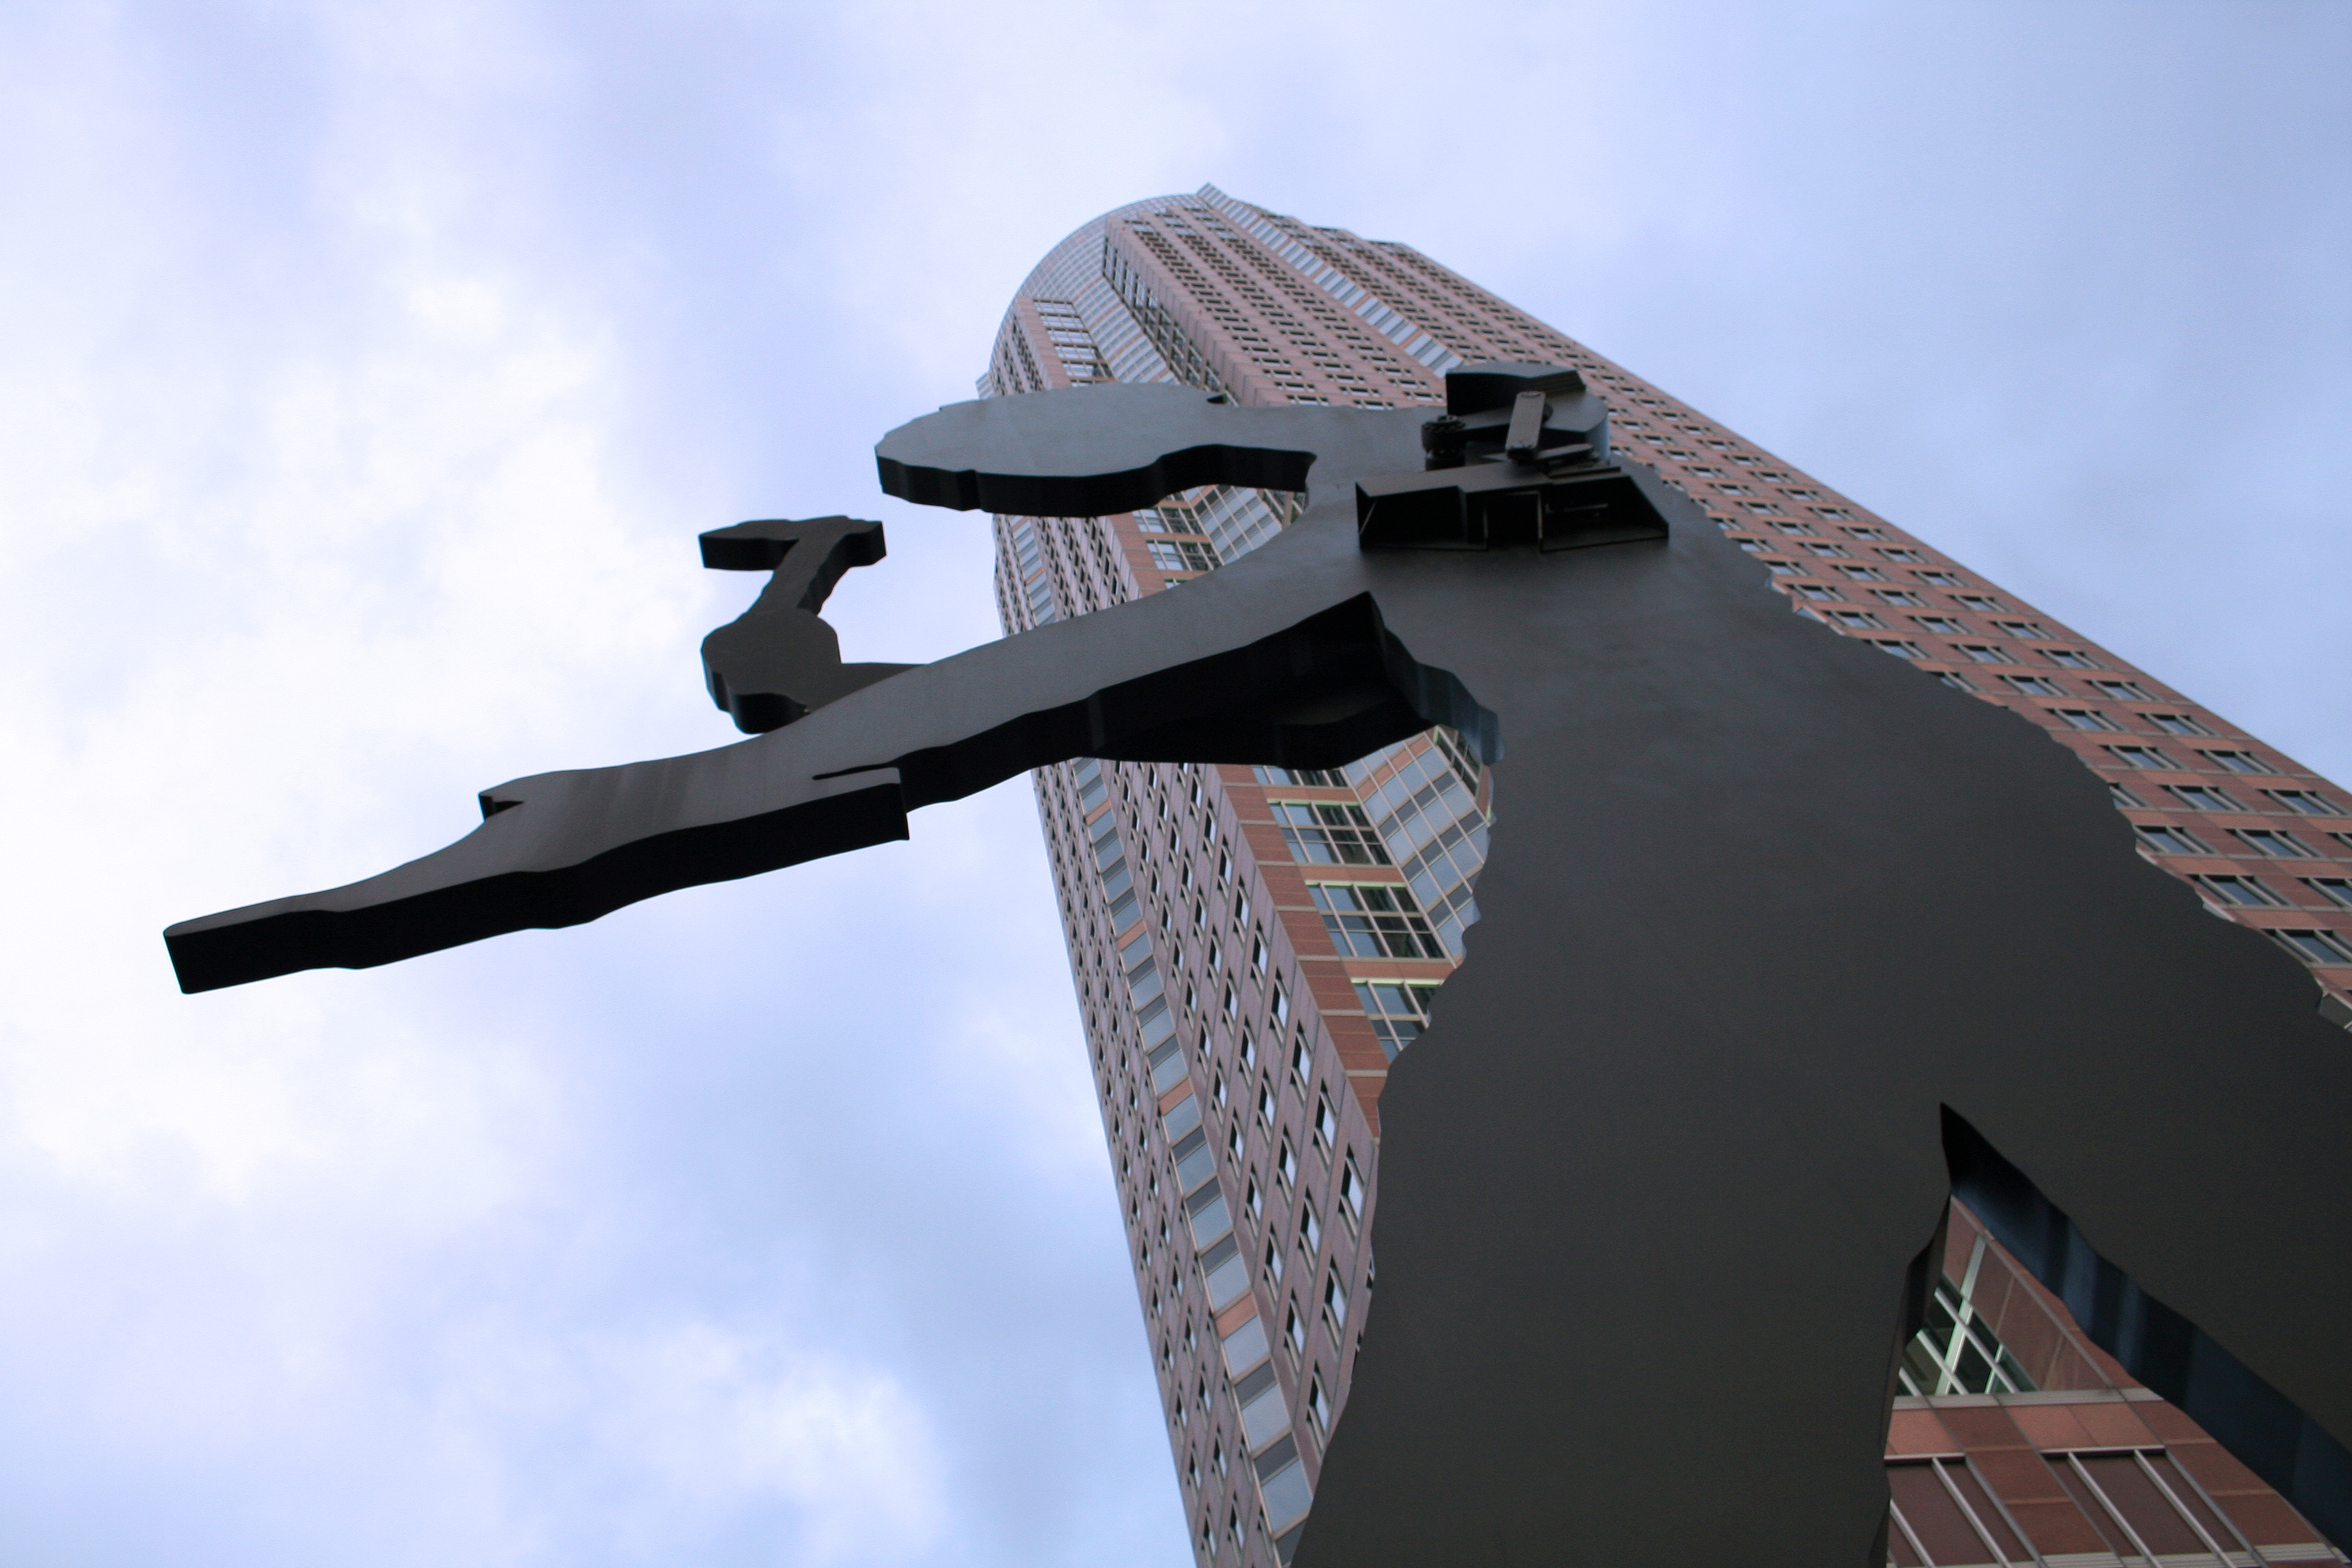 https://i2.wp.com/upload.wikimedia.org/wikipedia/commons/f/f4/Hammering_Man_vor_Messeturm.jpg